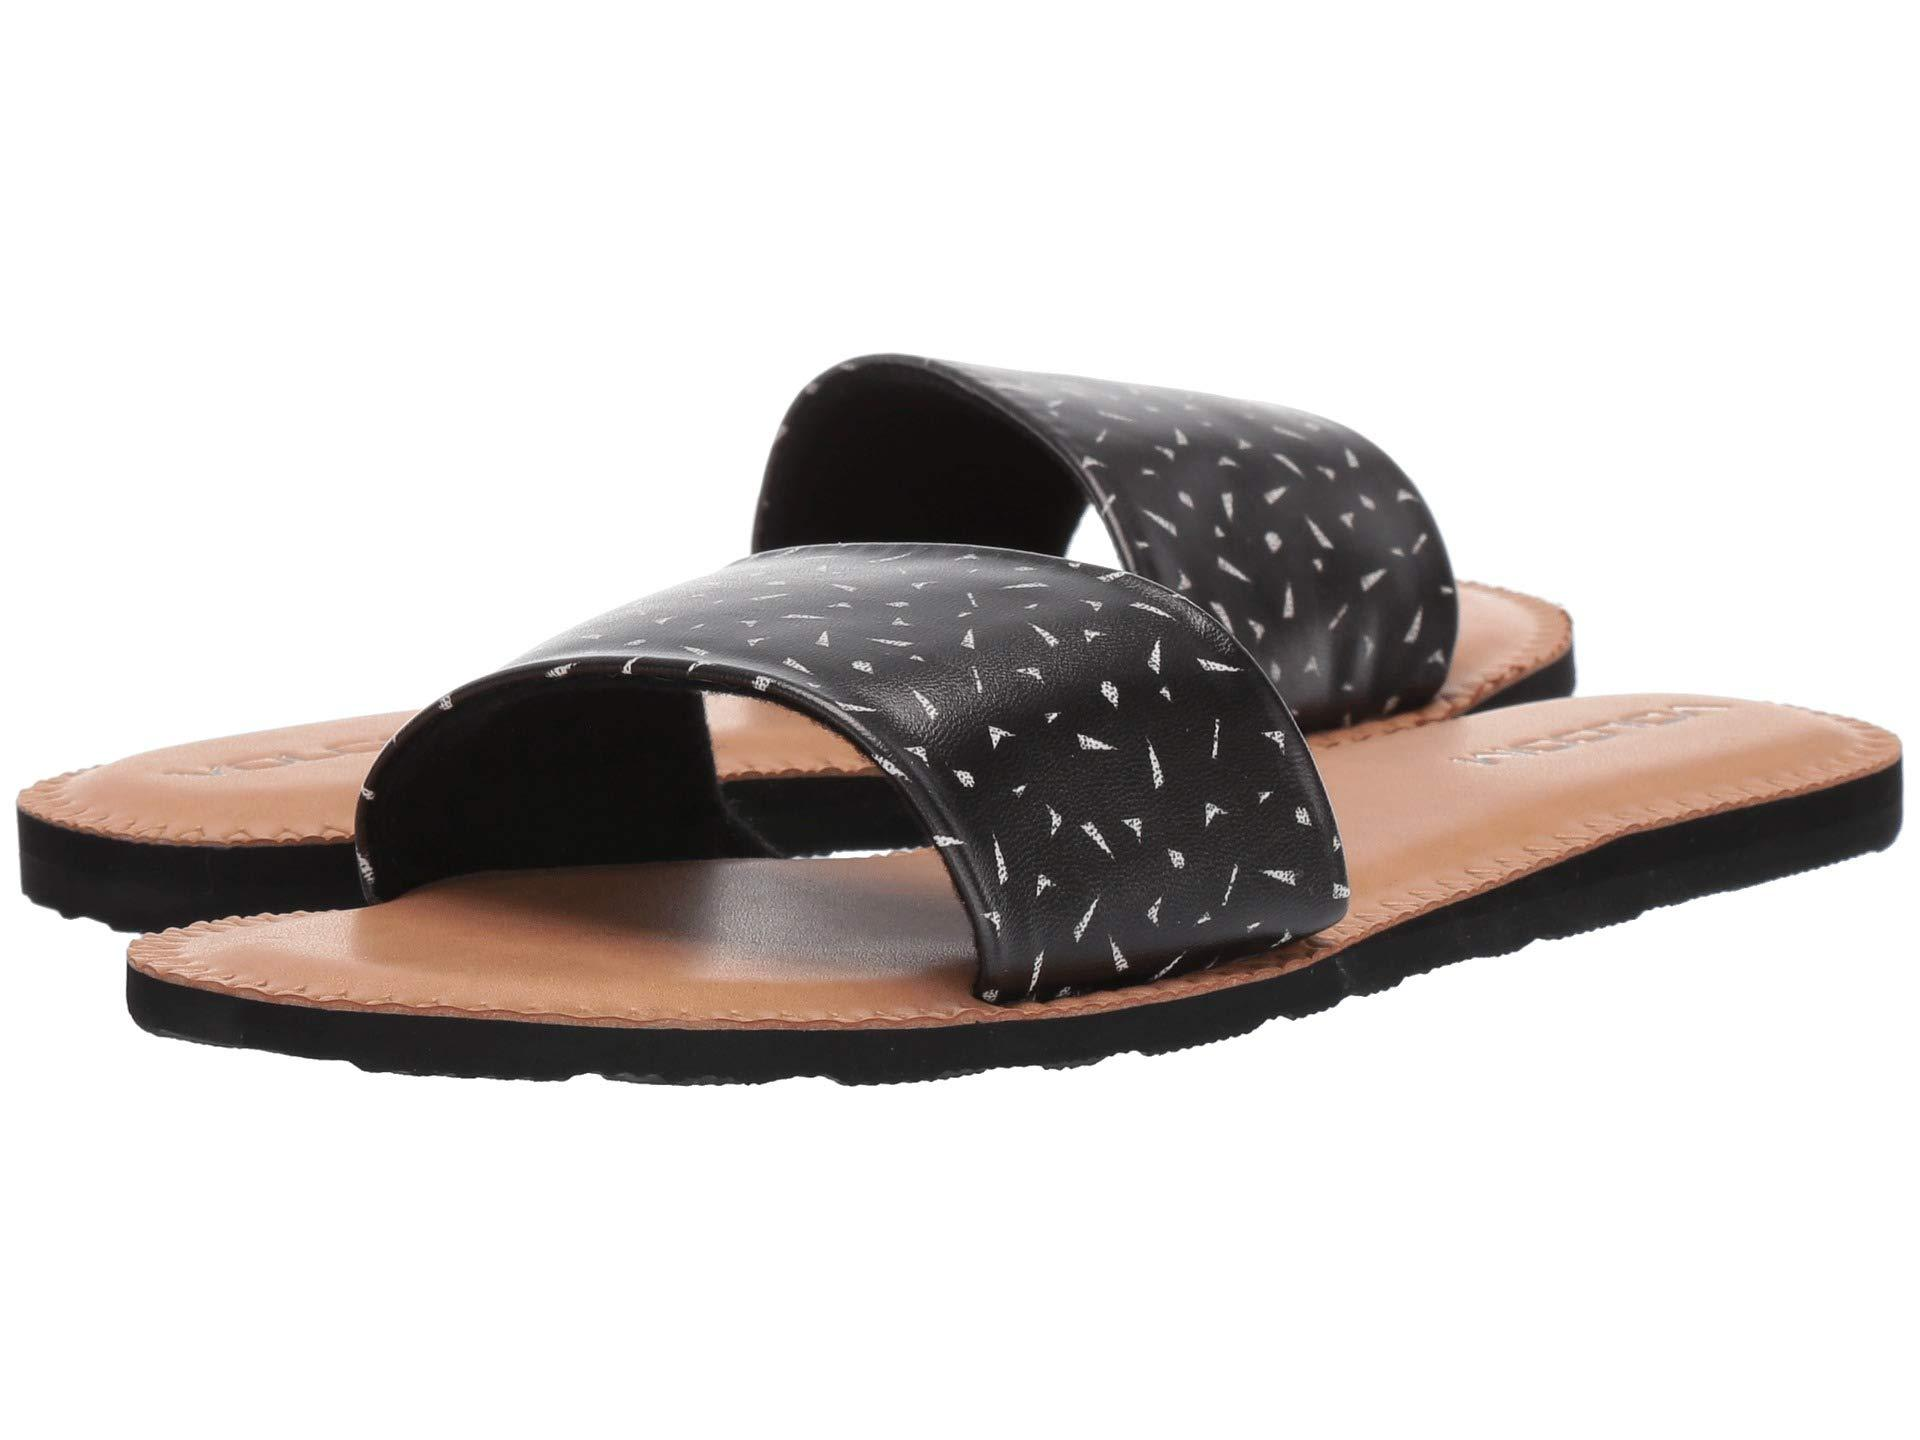 a6b3f3129 Volcom - Simple Slide Sandals (black Combo) Women s Sandals - Lyst. View  fullscreen